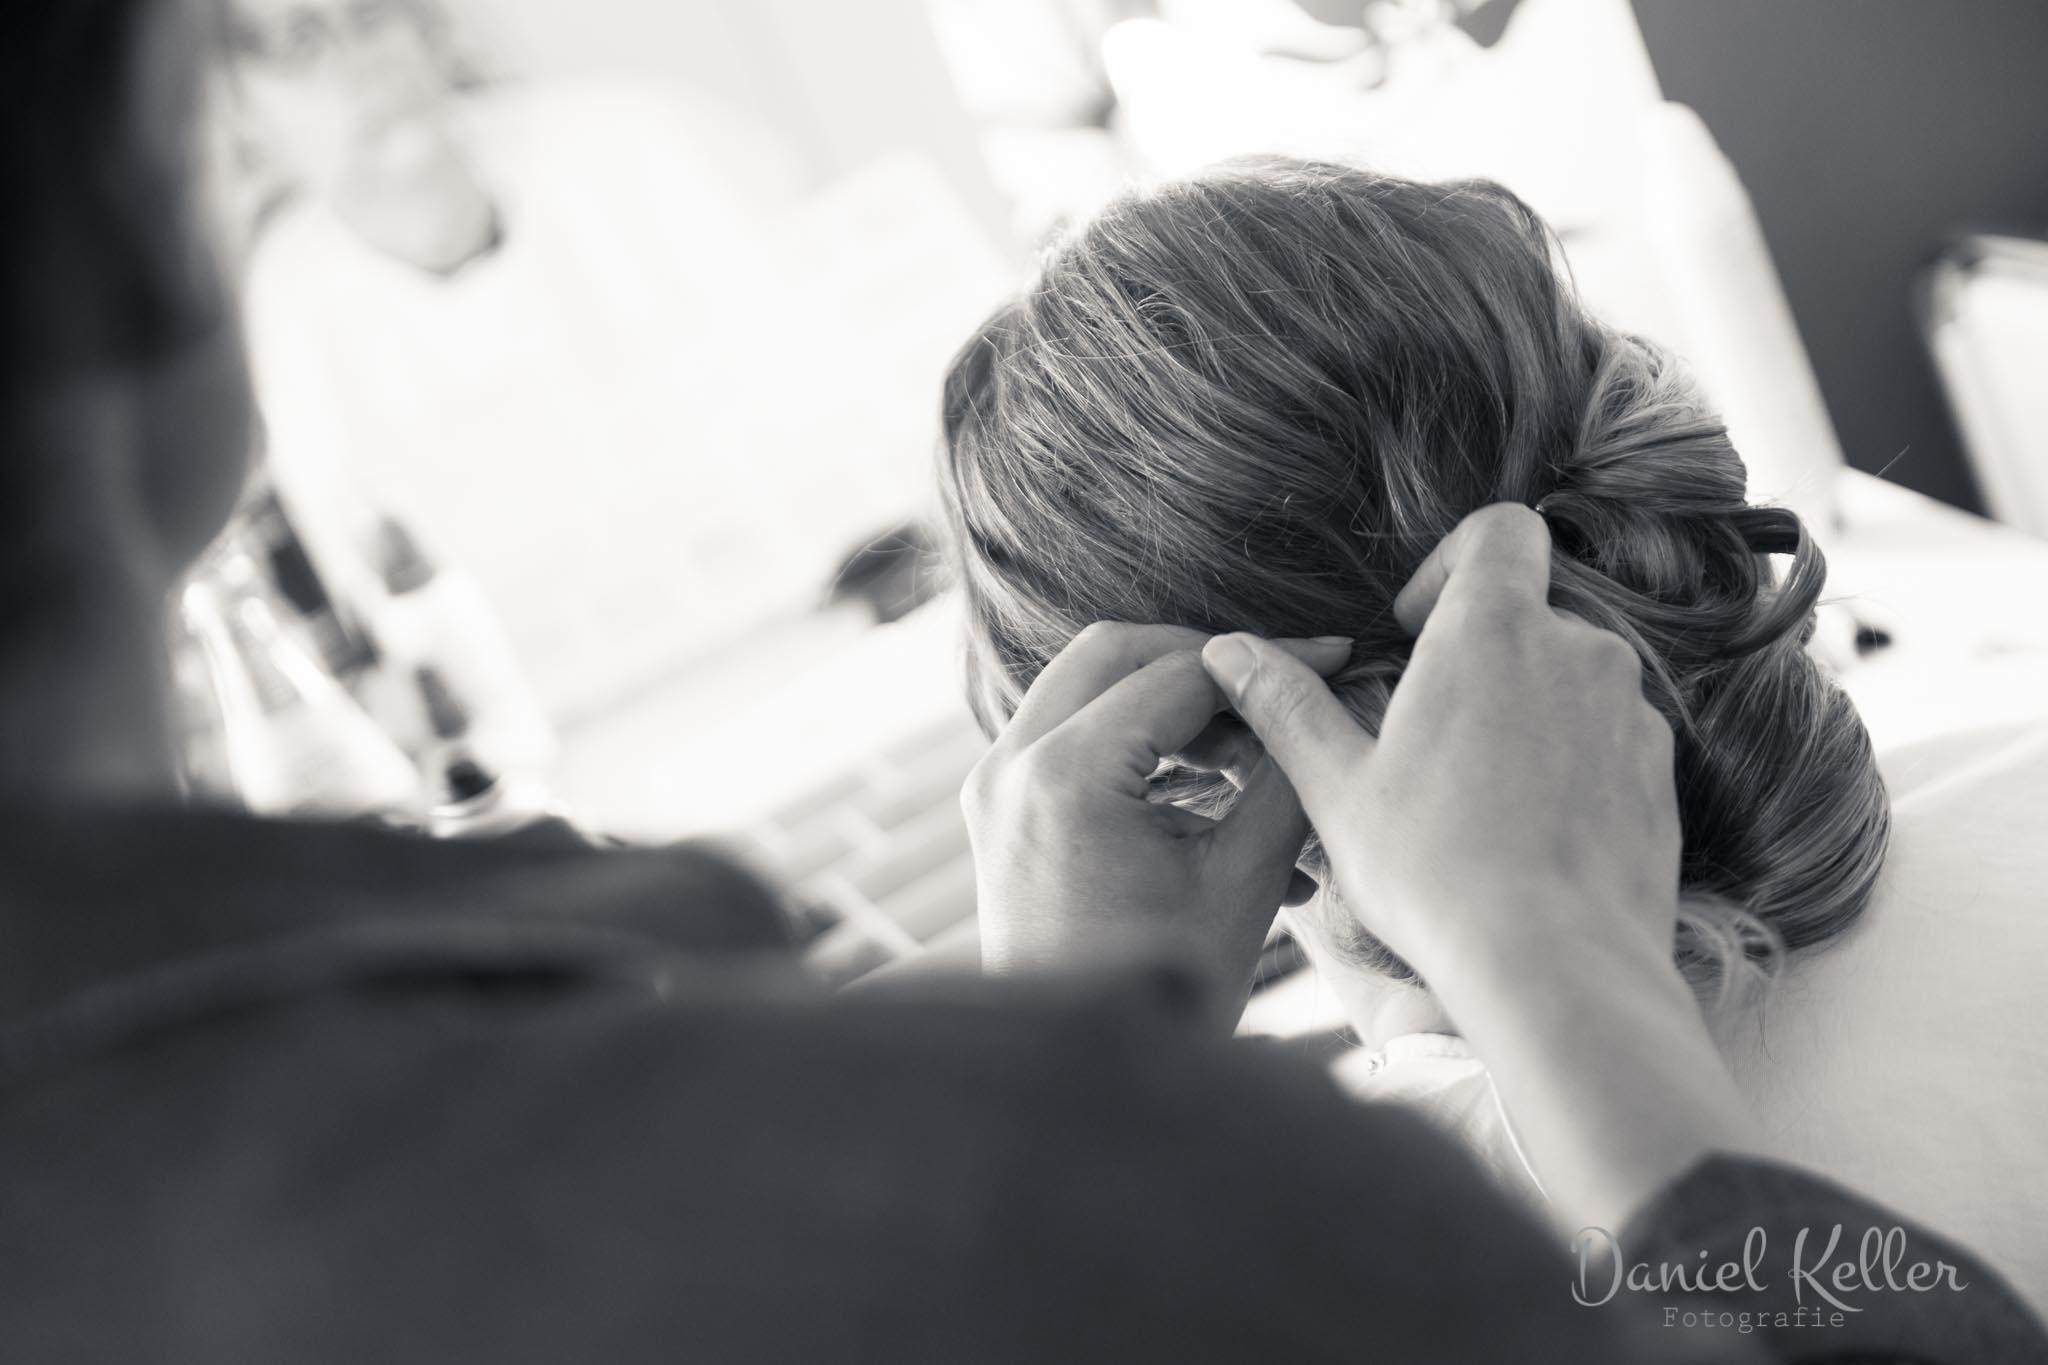 Getting Ready bei Milena Kehayova Offenburg / Daniel Keller Fotografie